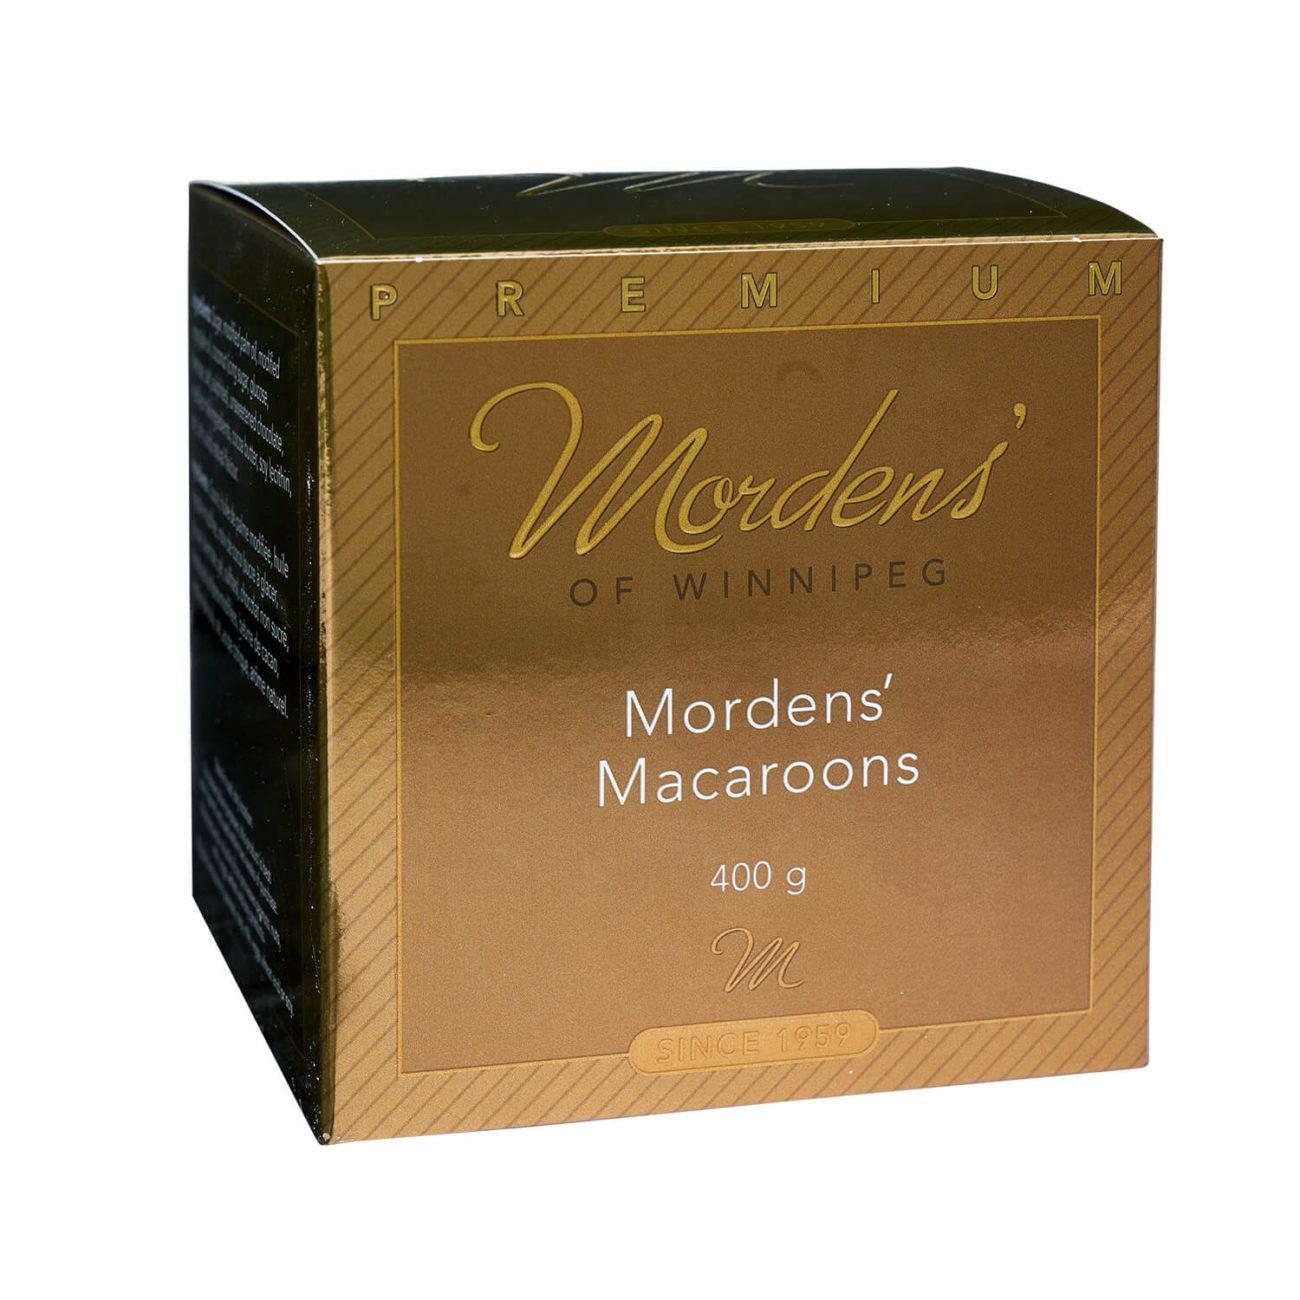 Mordens' Macaroons